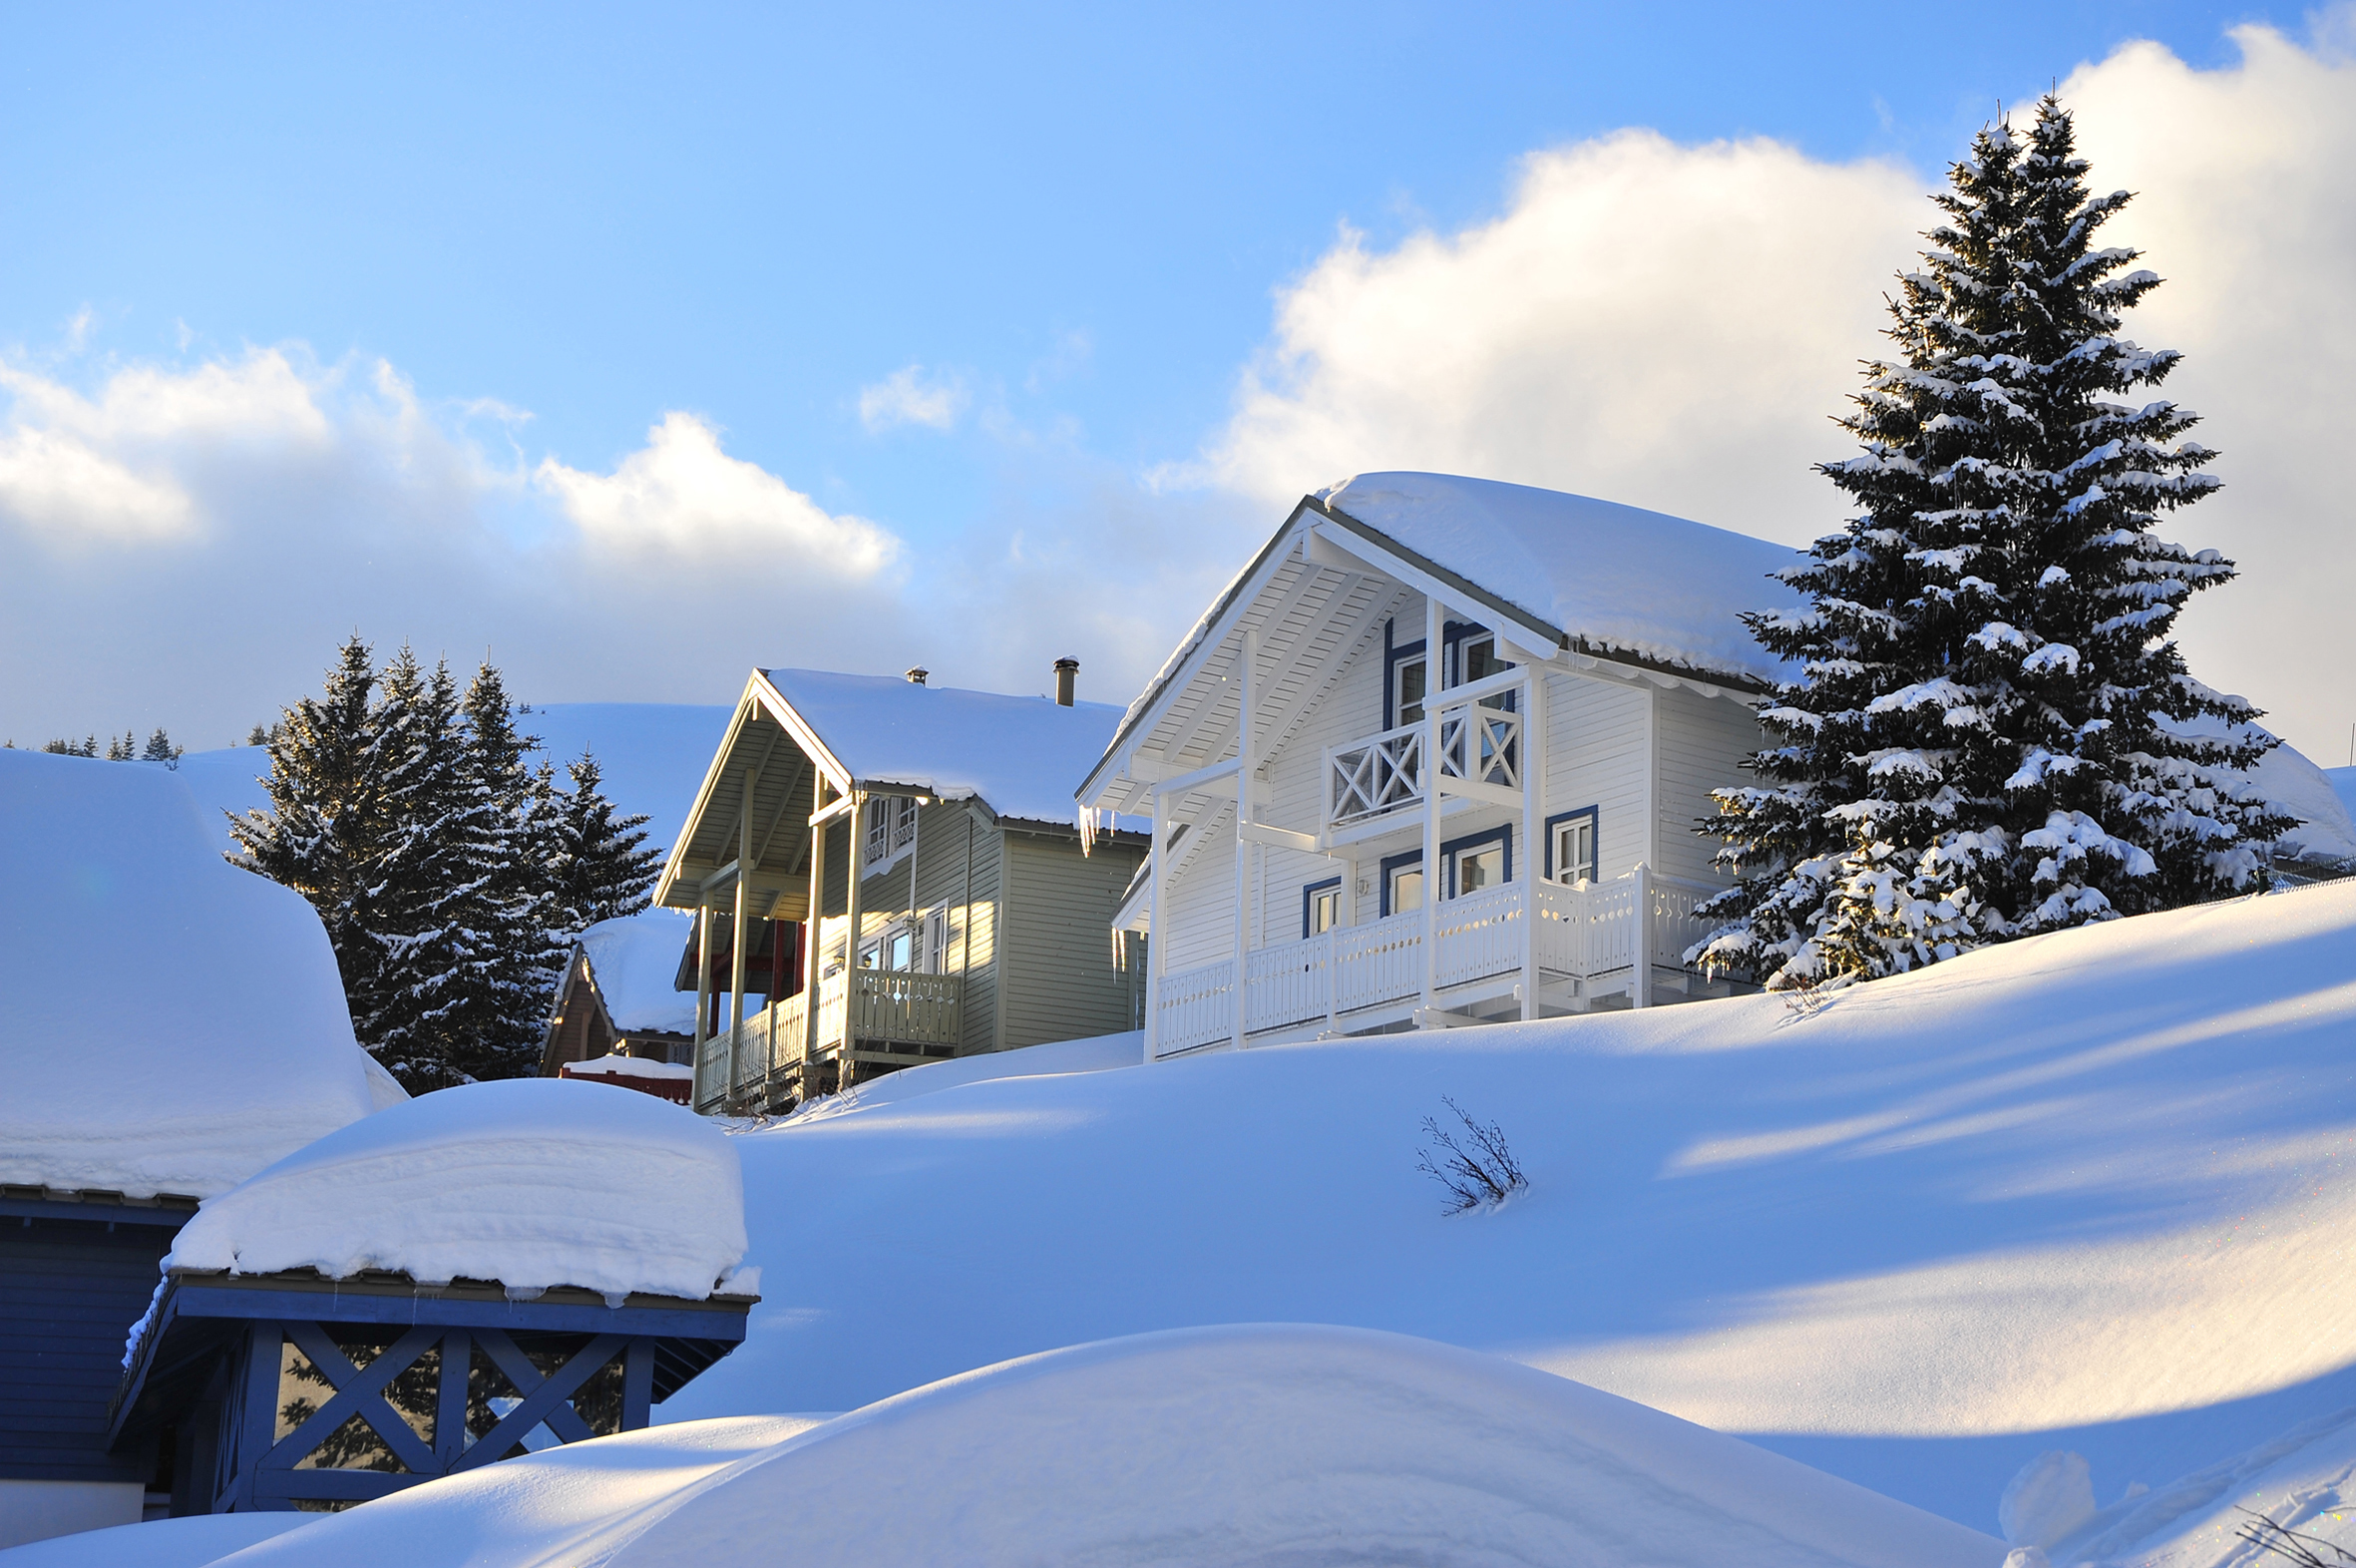 Flaine - Ski Club of Great Britain